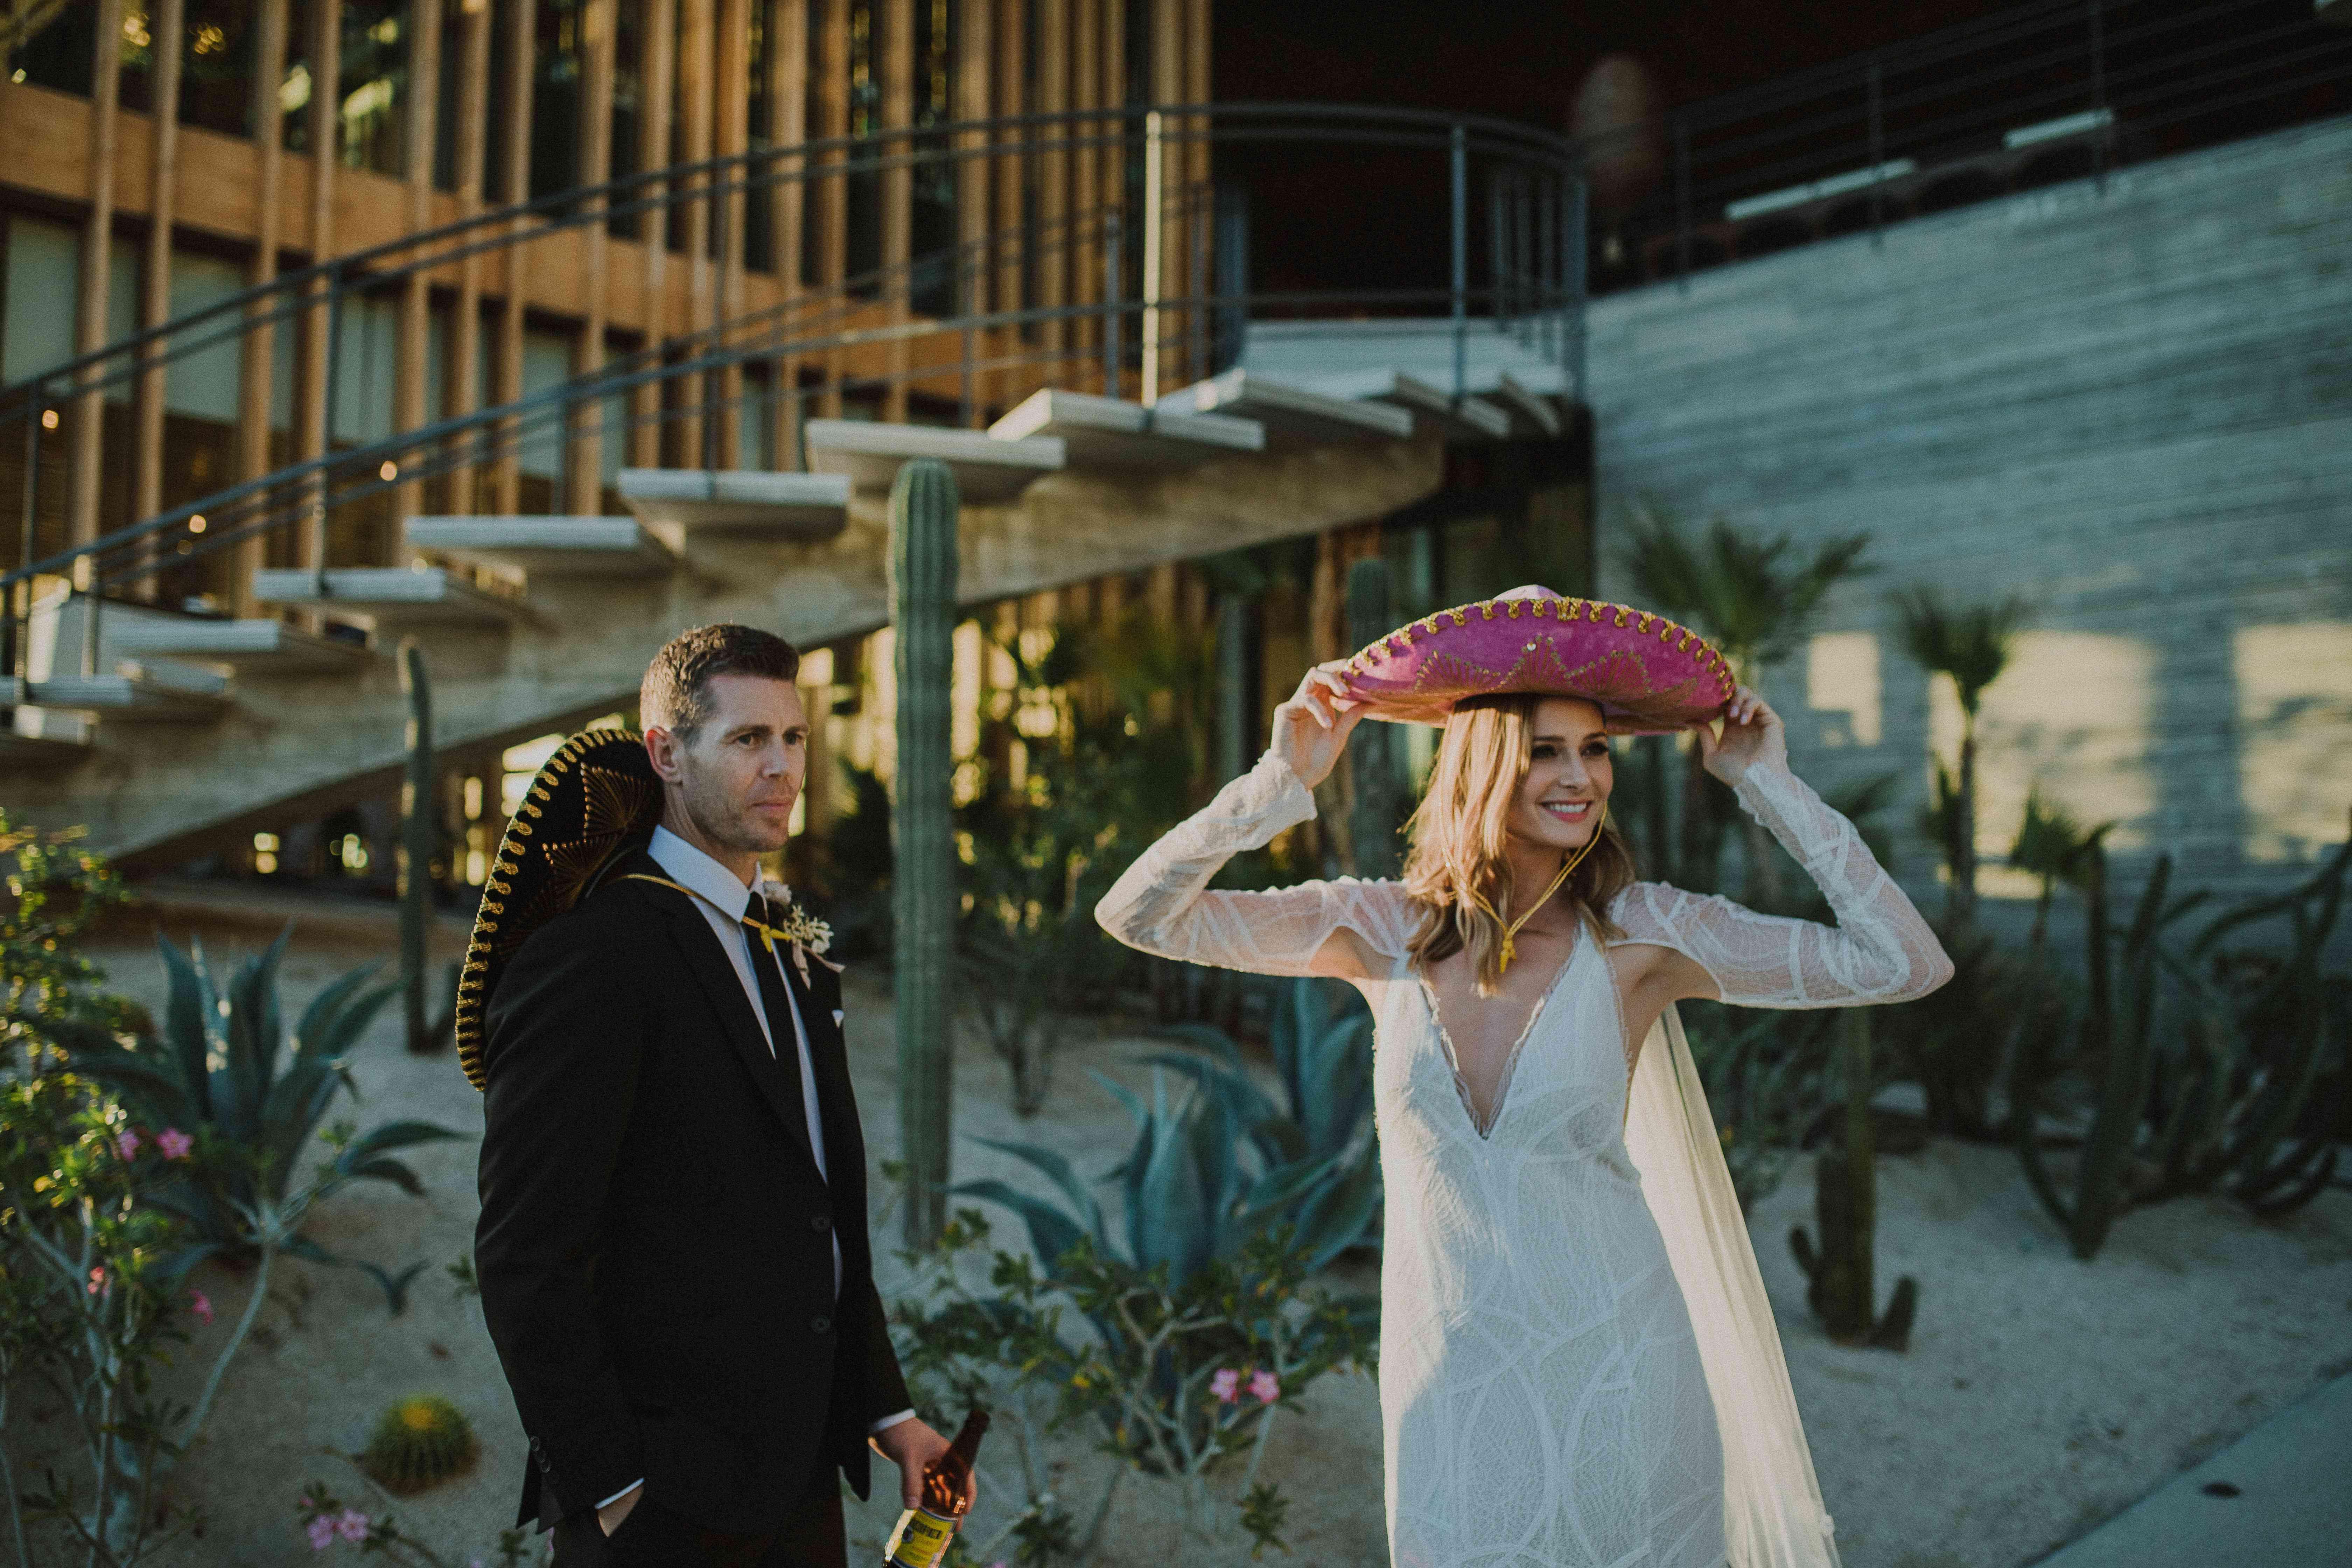 Bride and Groom in Sombrero Hats